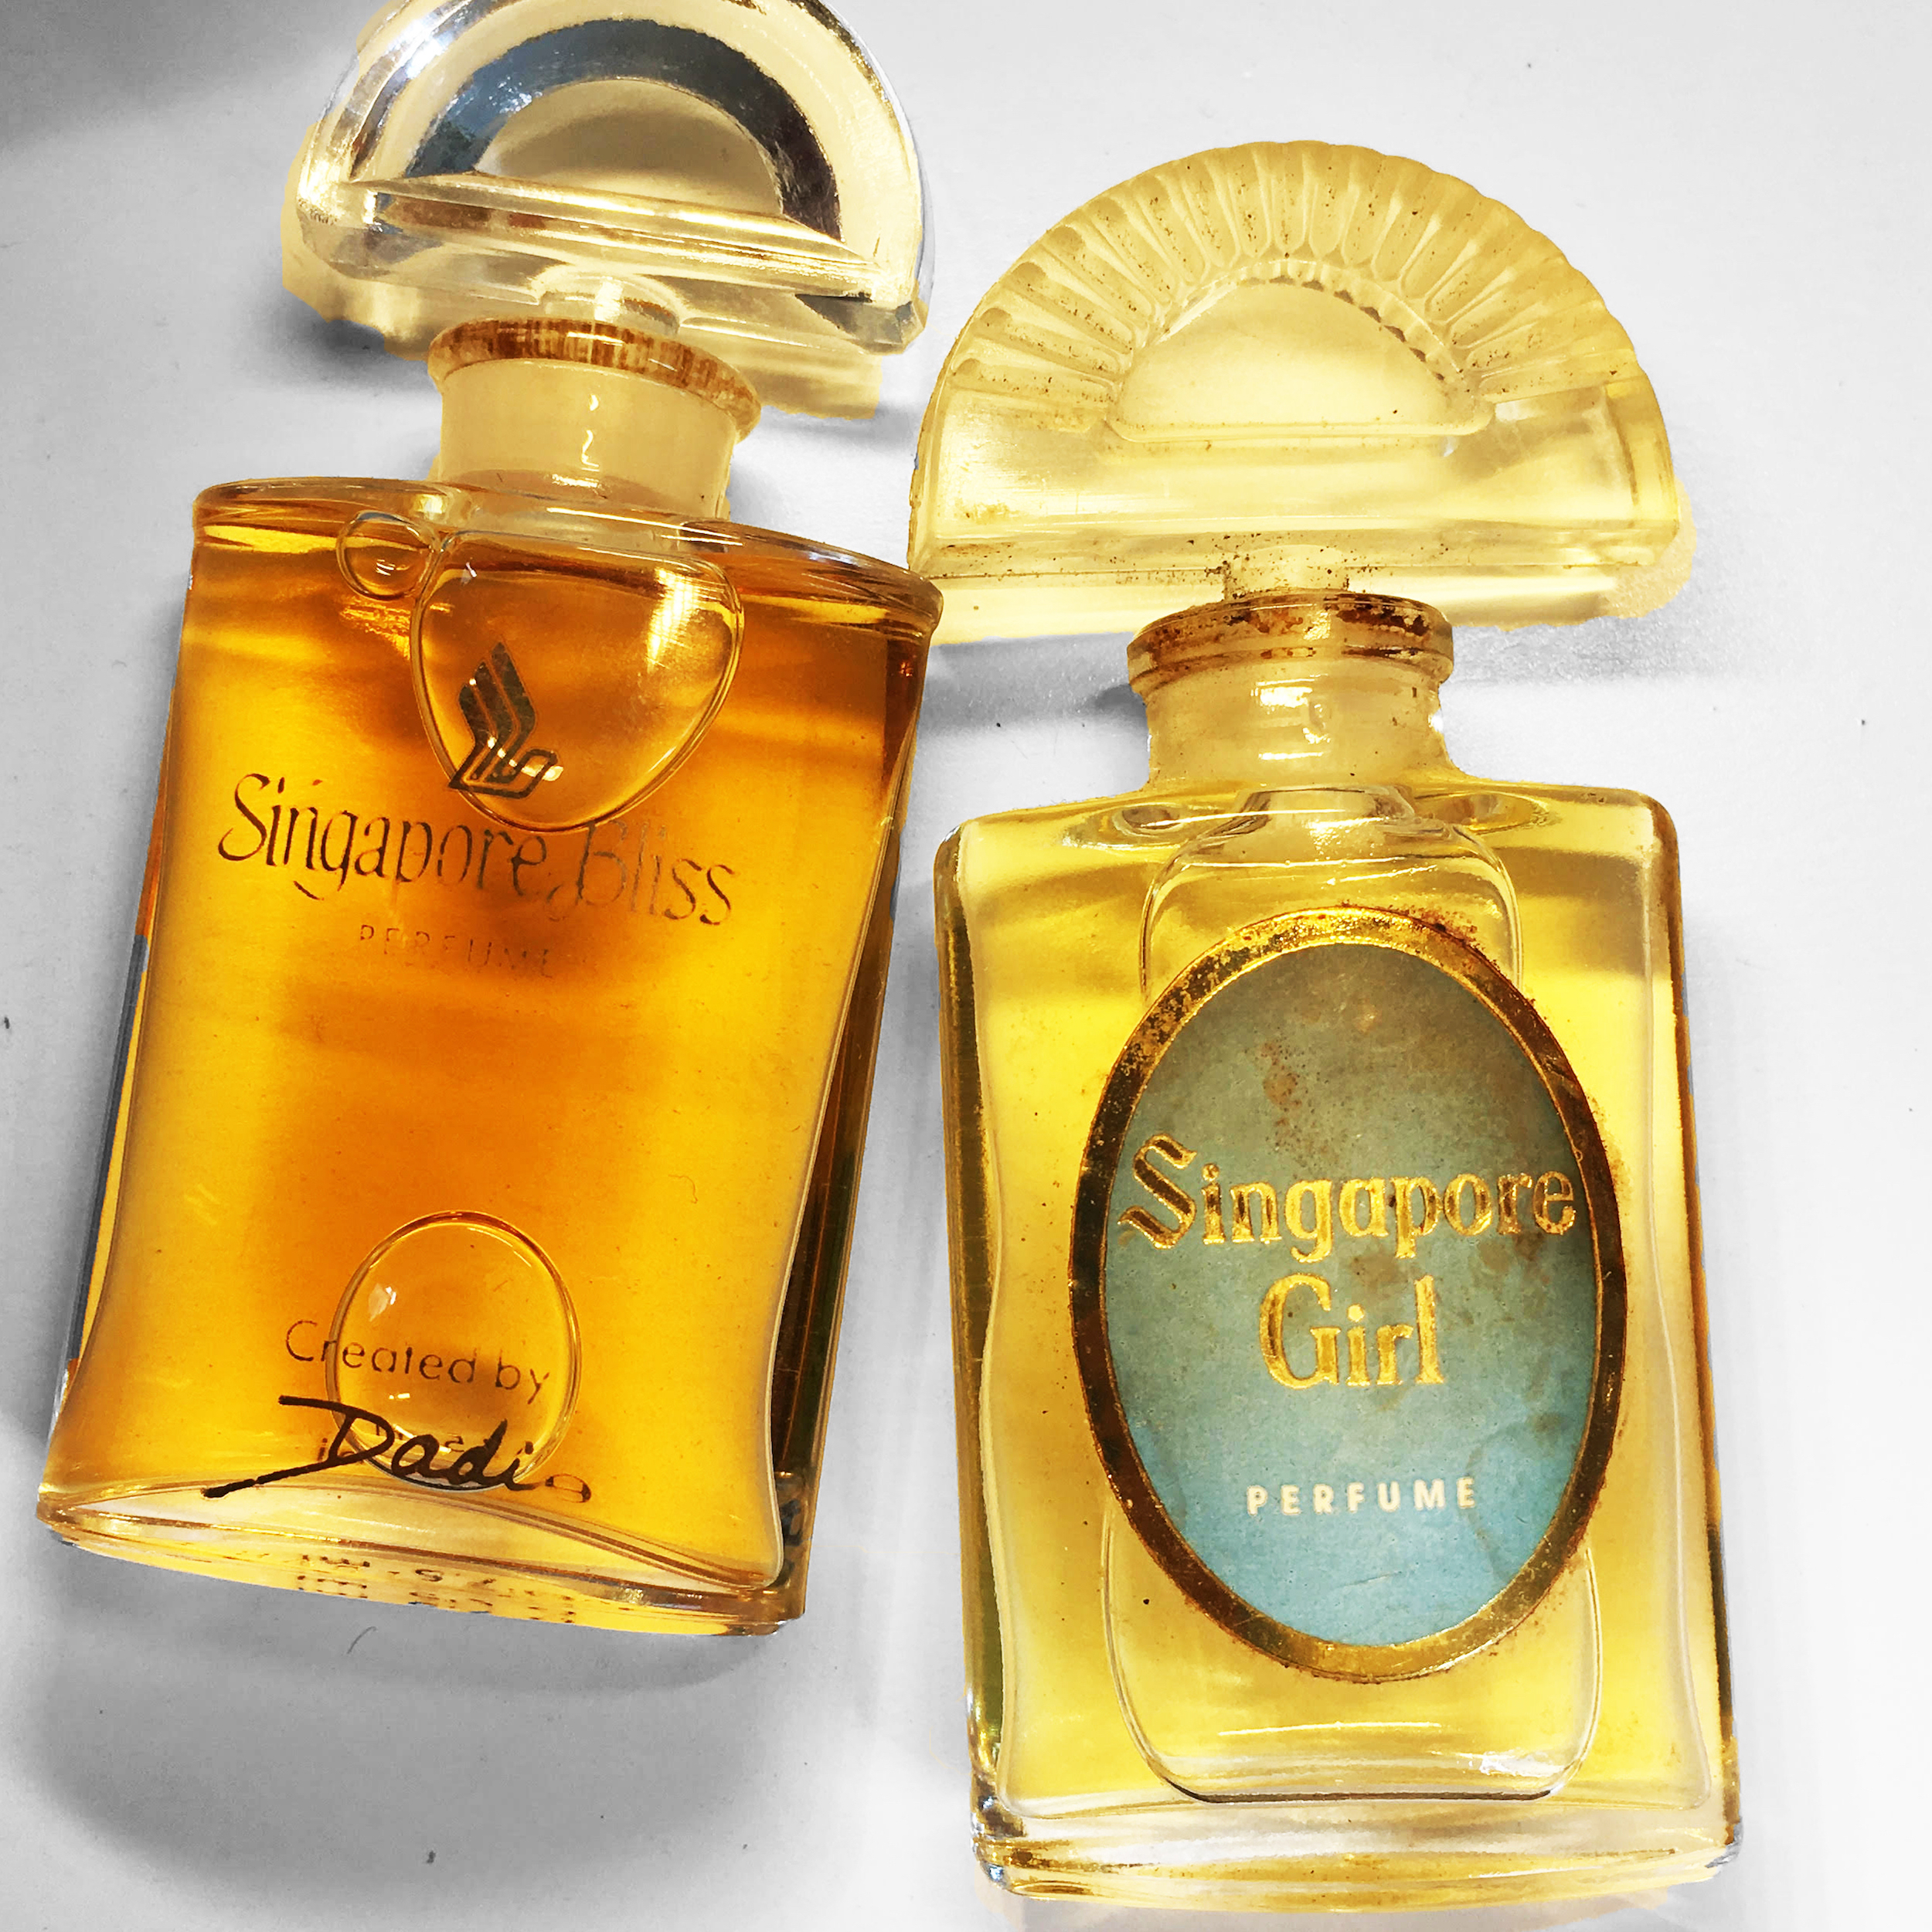 Girl Perfume Wikipedia Girl Singapore Perfume Singapore Perfume Wikipedia Girl Singapore PXiOZku